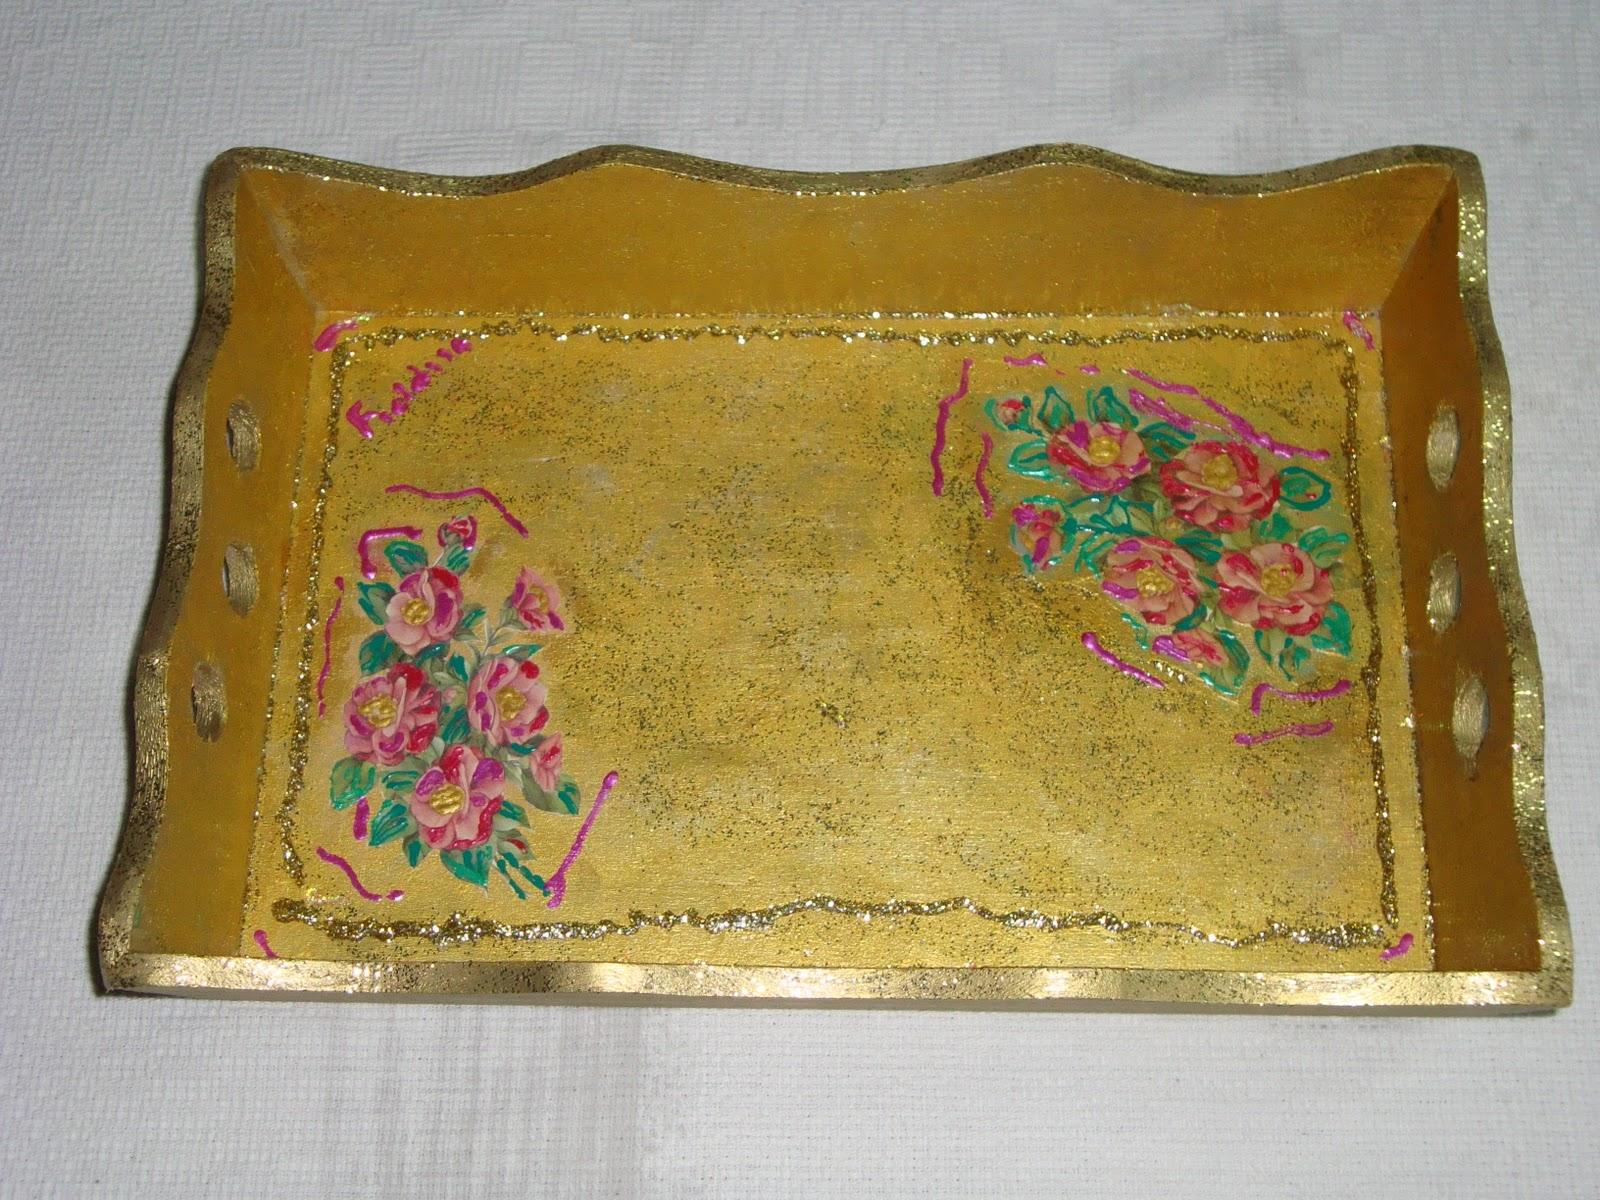 magicamenteart Fioldisa Luongo: Vassoi in legno decorati a mano